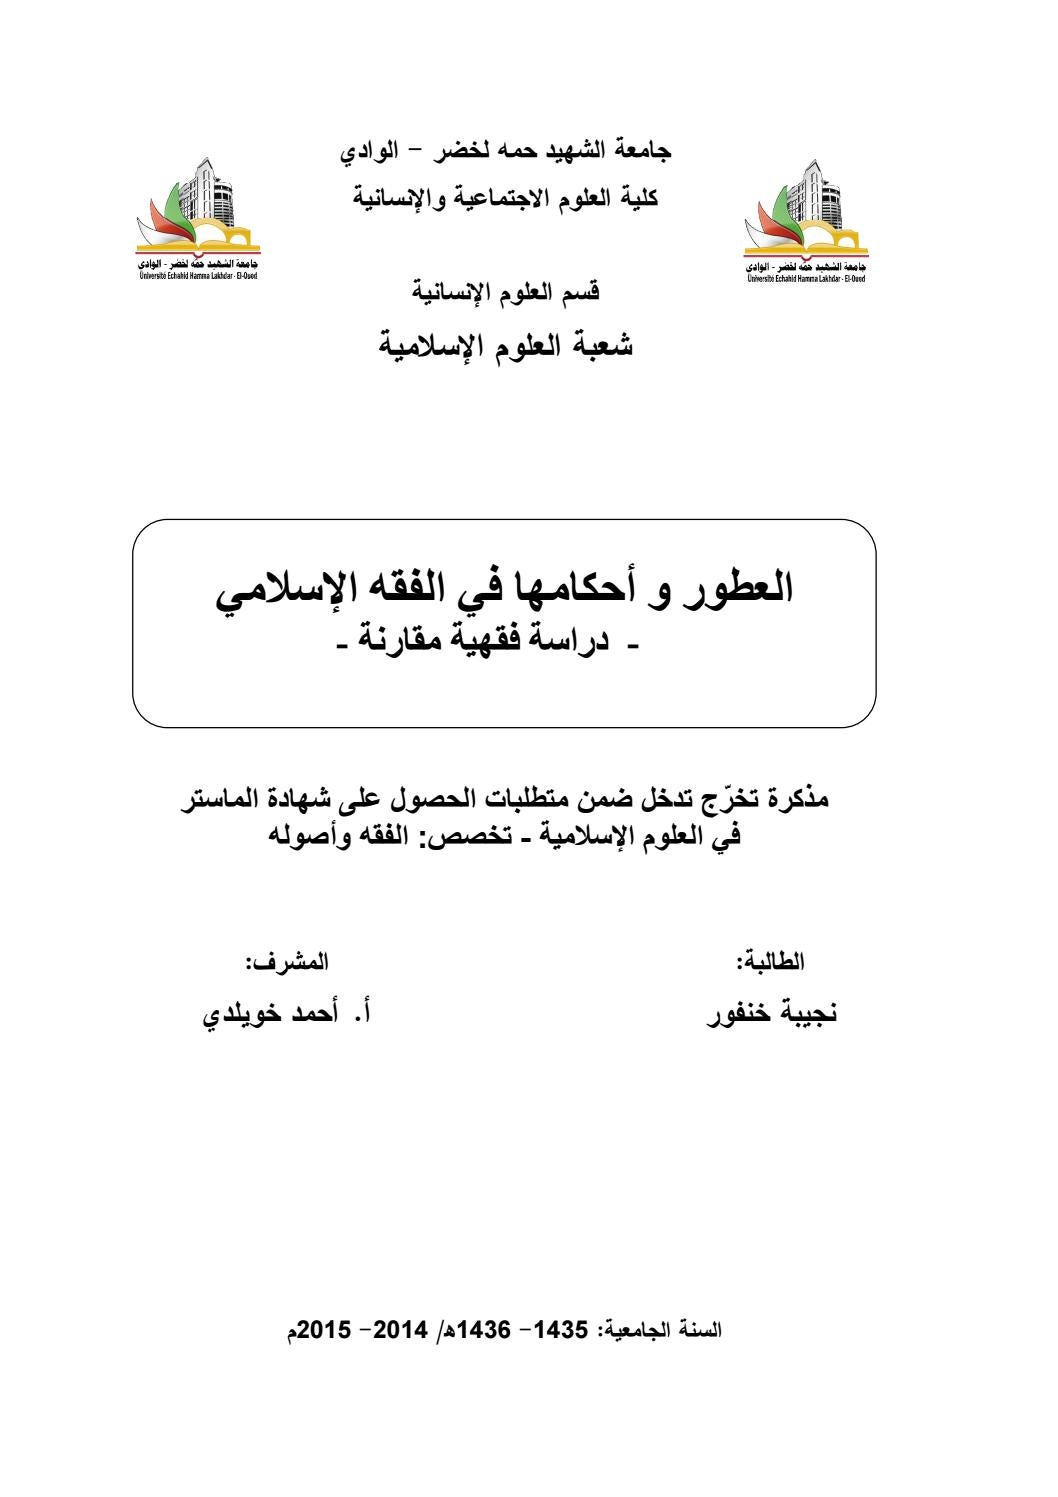 49a8e9b28 العطور واحكامها في الفقه الاسلامي by Adel Almohsen - issuu